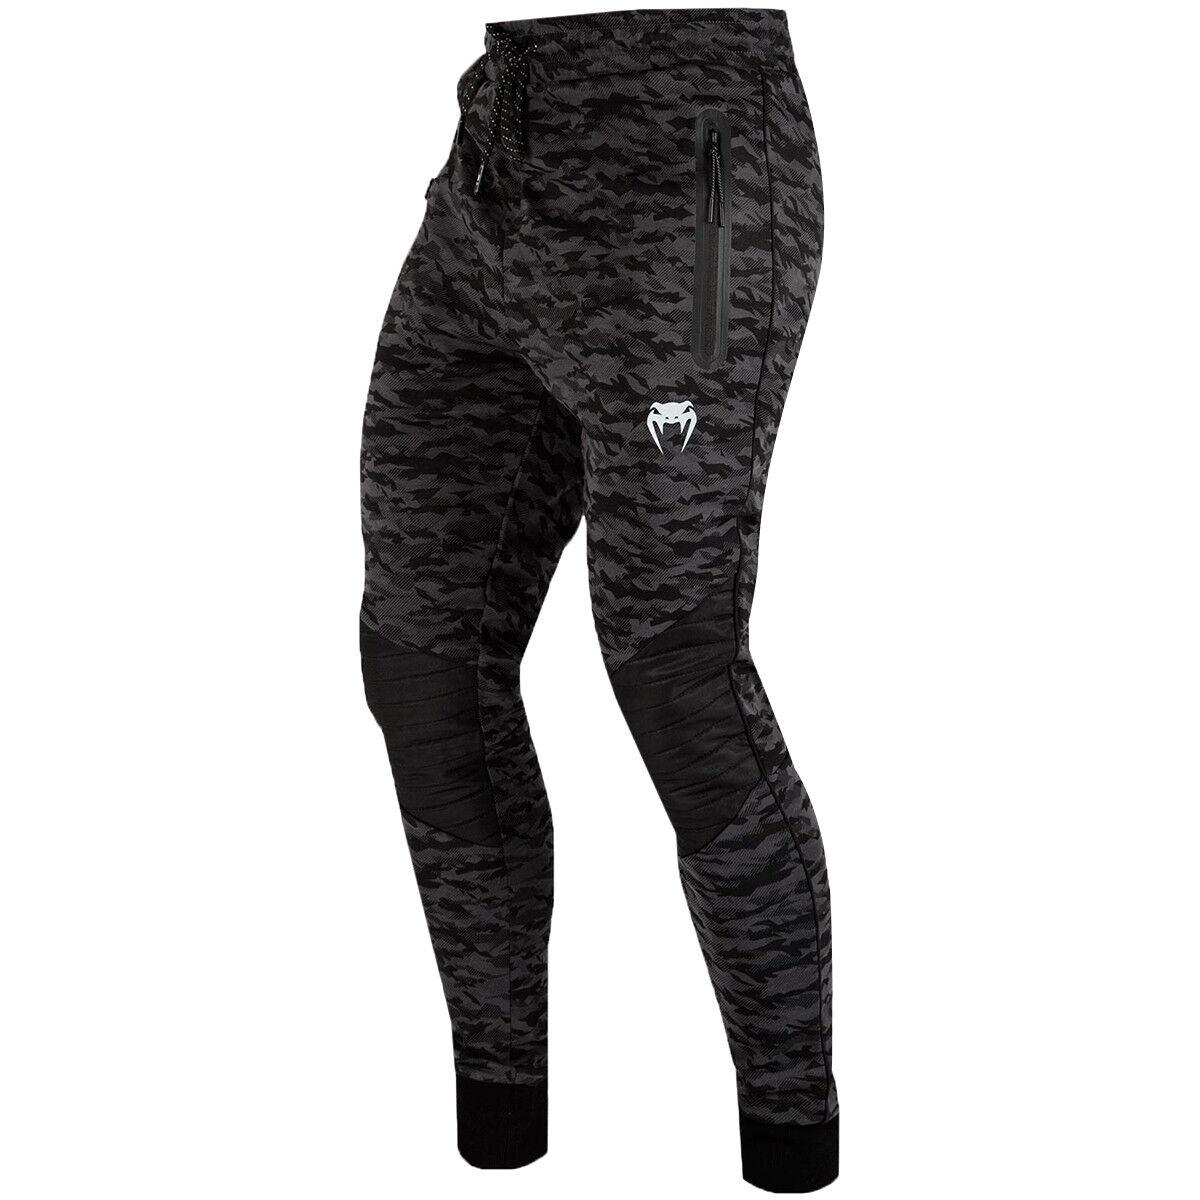 Venum Laser DrankstRing Waist Fit Cut Jogging Pants --Dark Camo